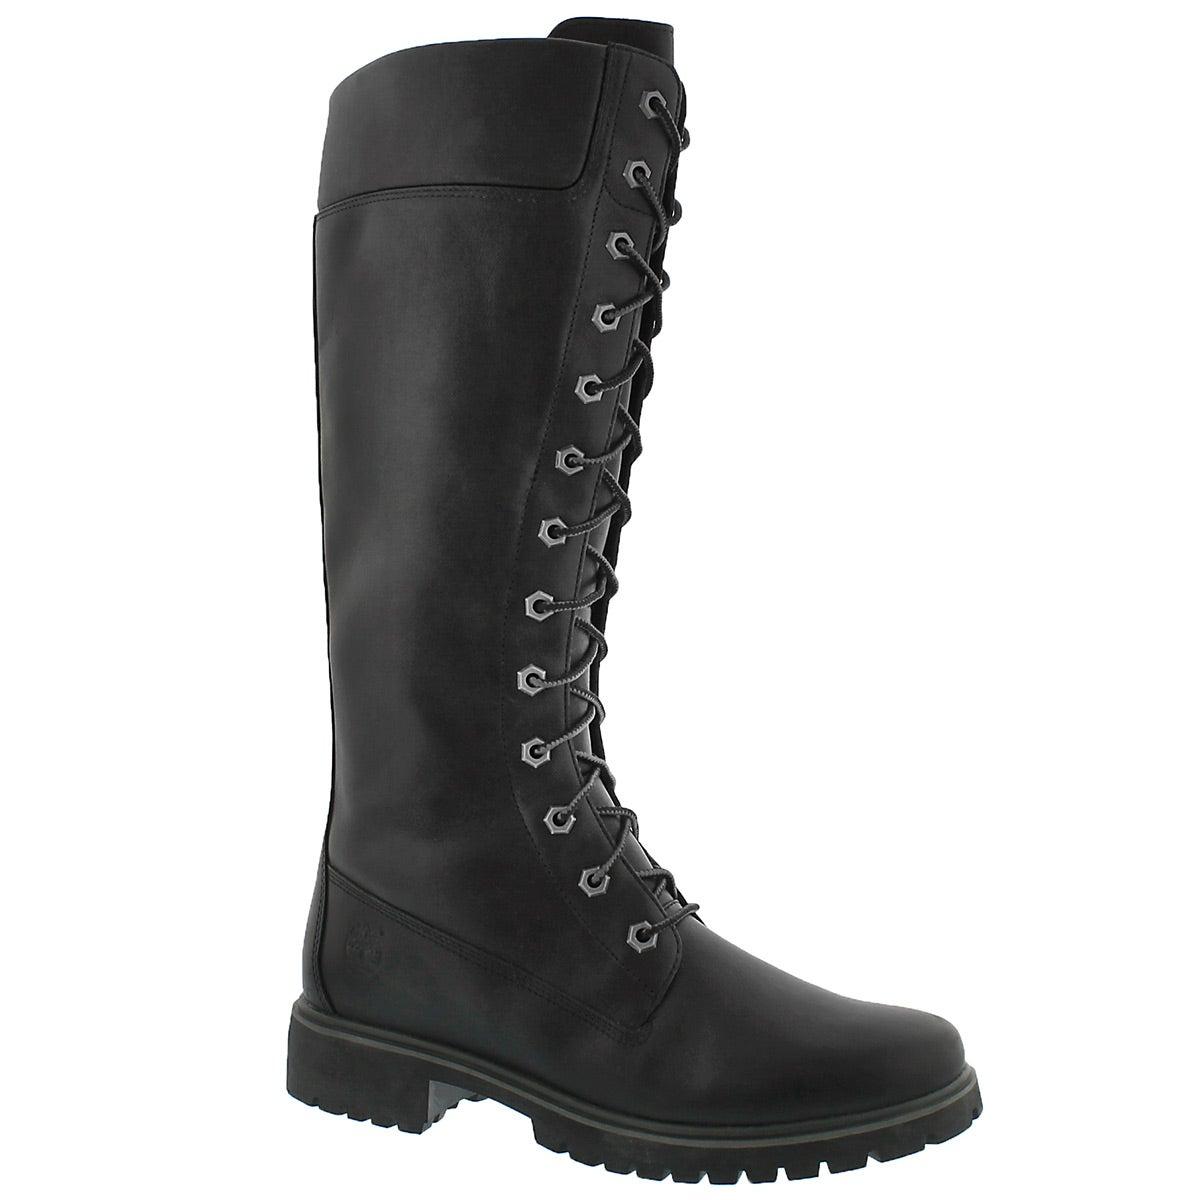 "Women's PREMIUM 14"" black tall boots"